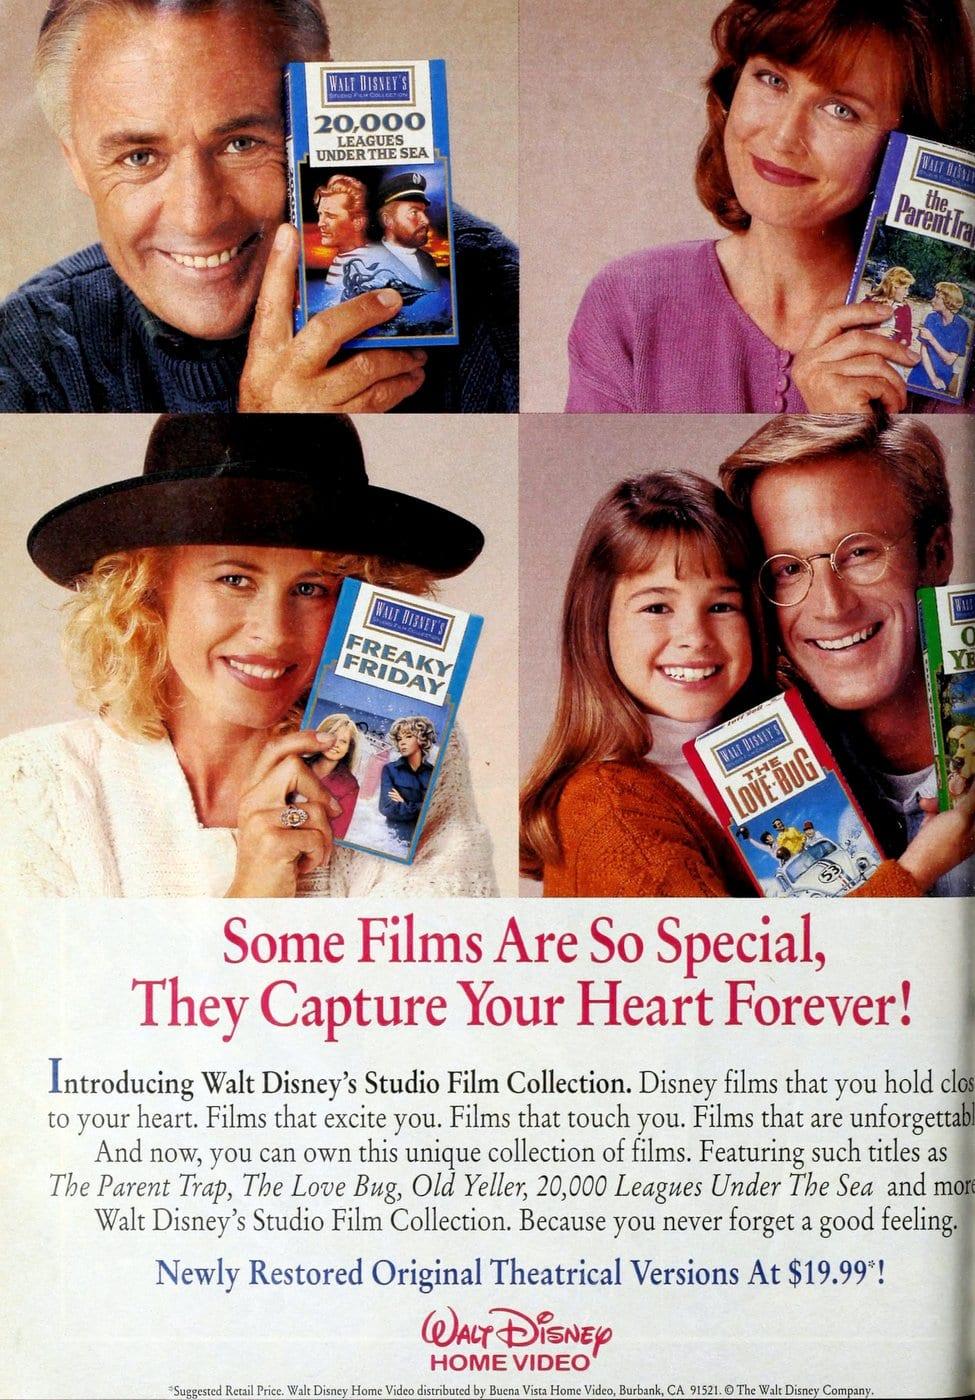 Walt Disney Studio Film Collection (1992)